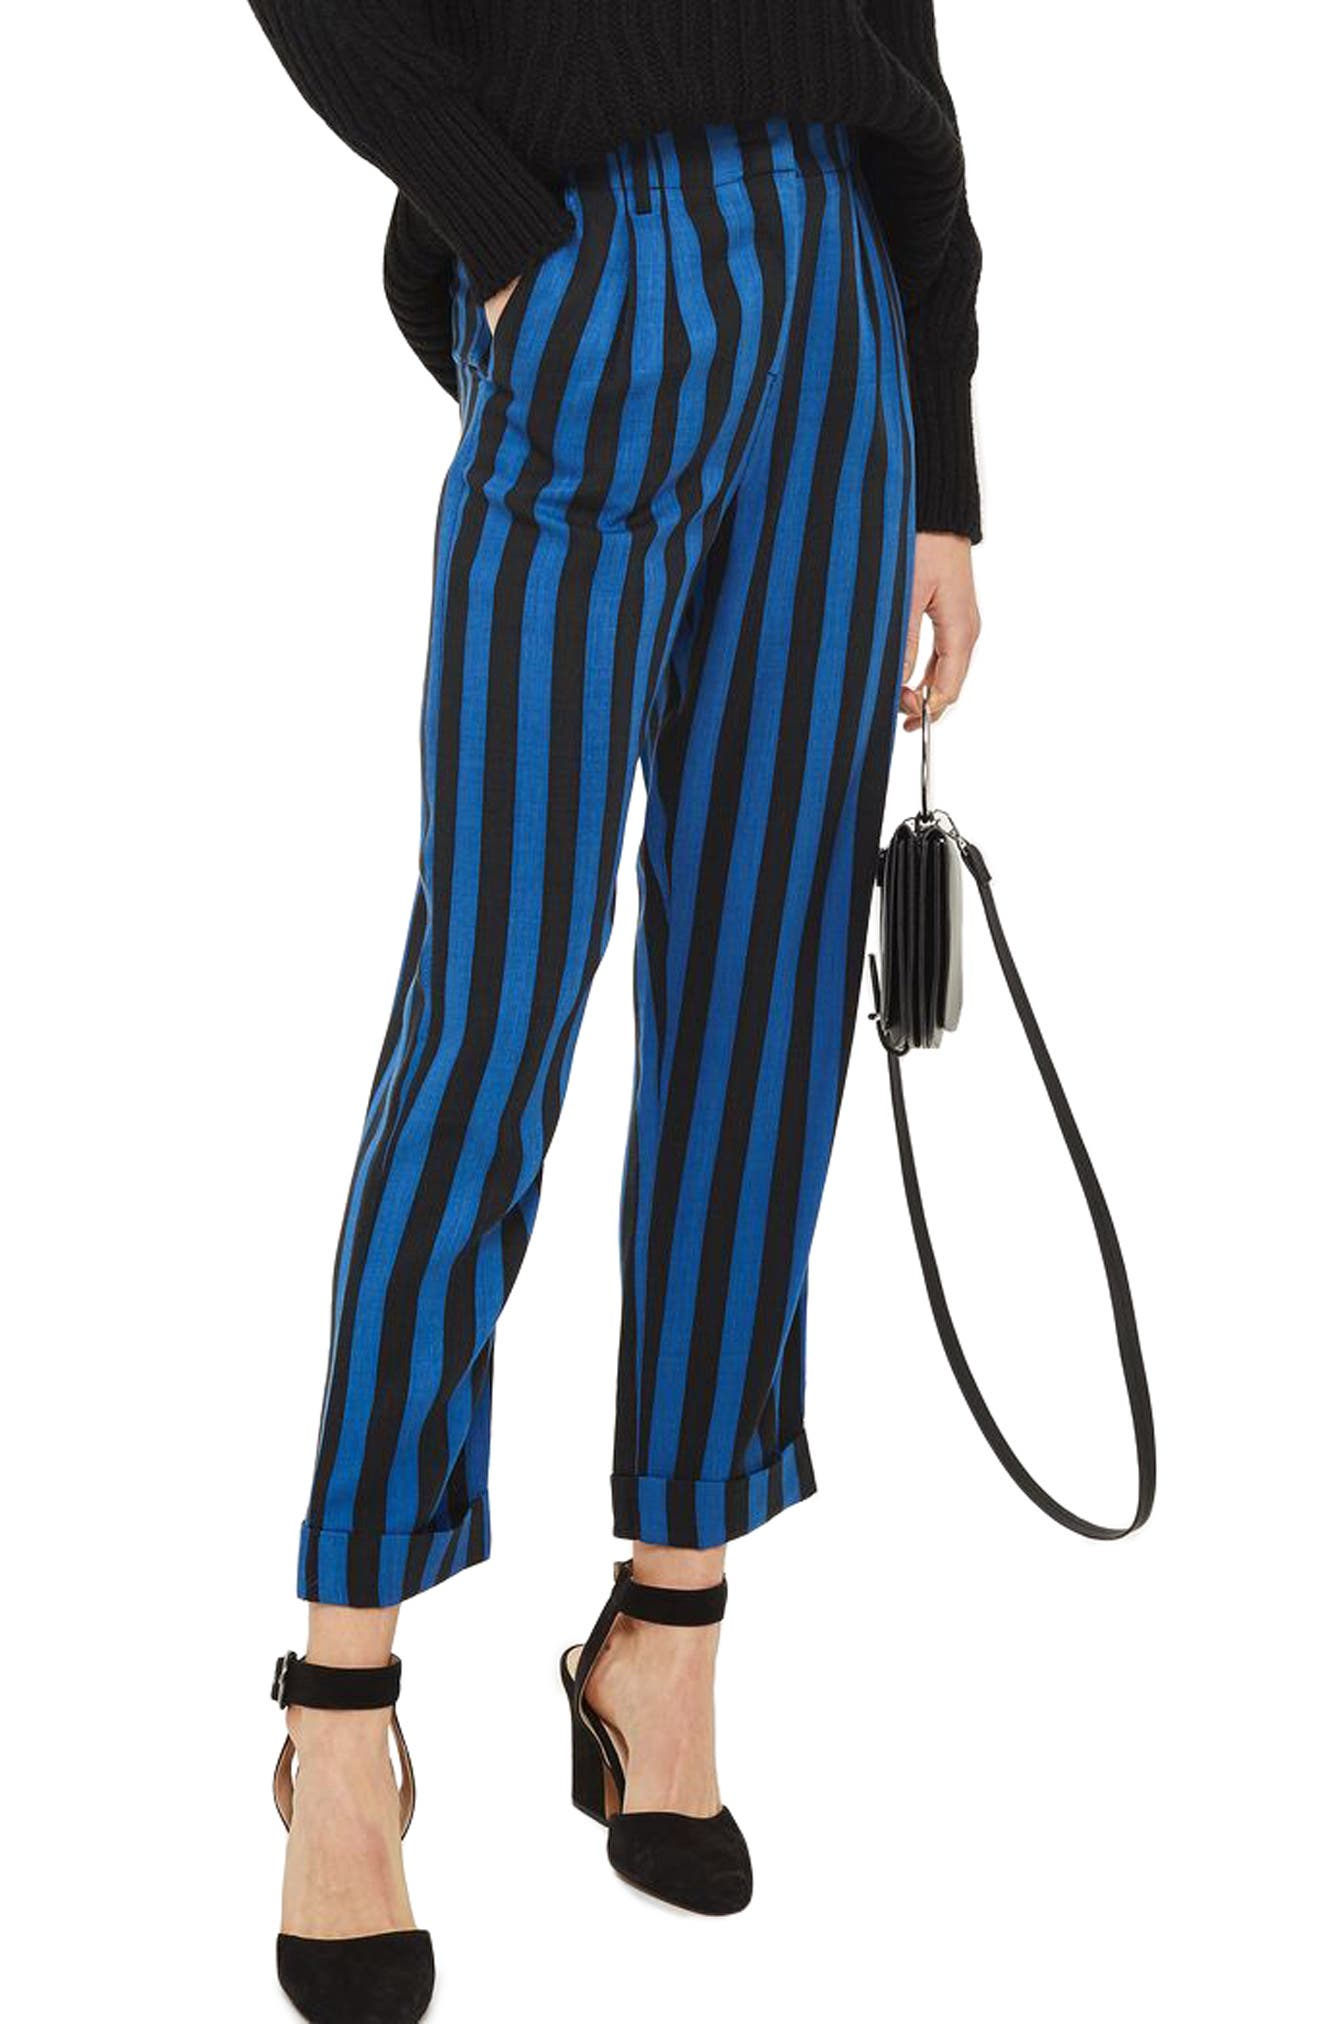 Topshop Humbug Stripe Crop Trousers